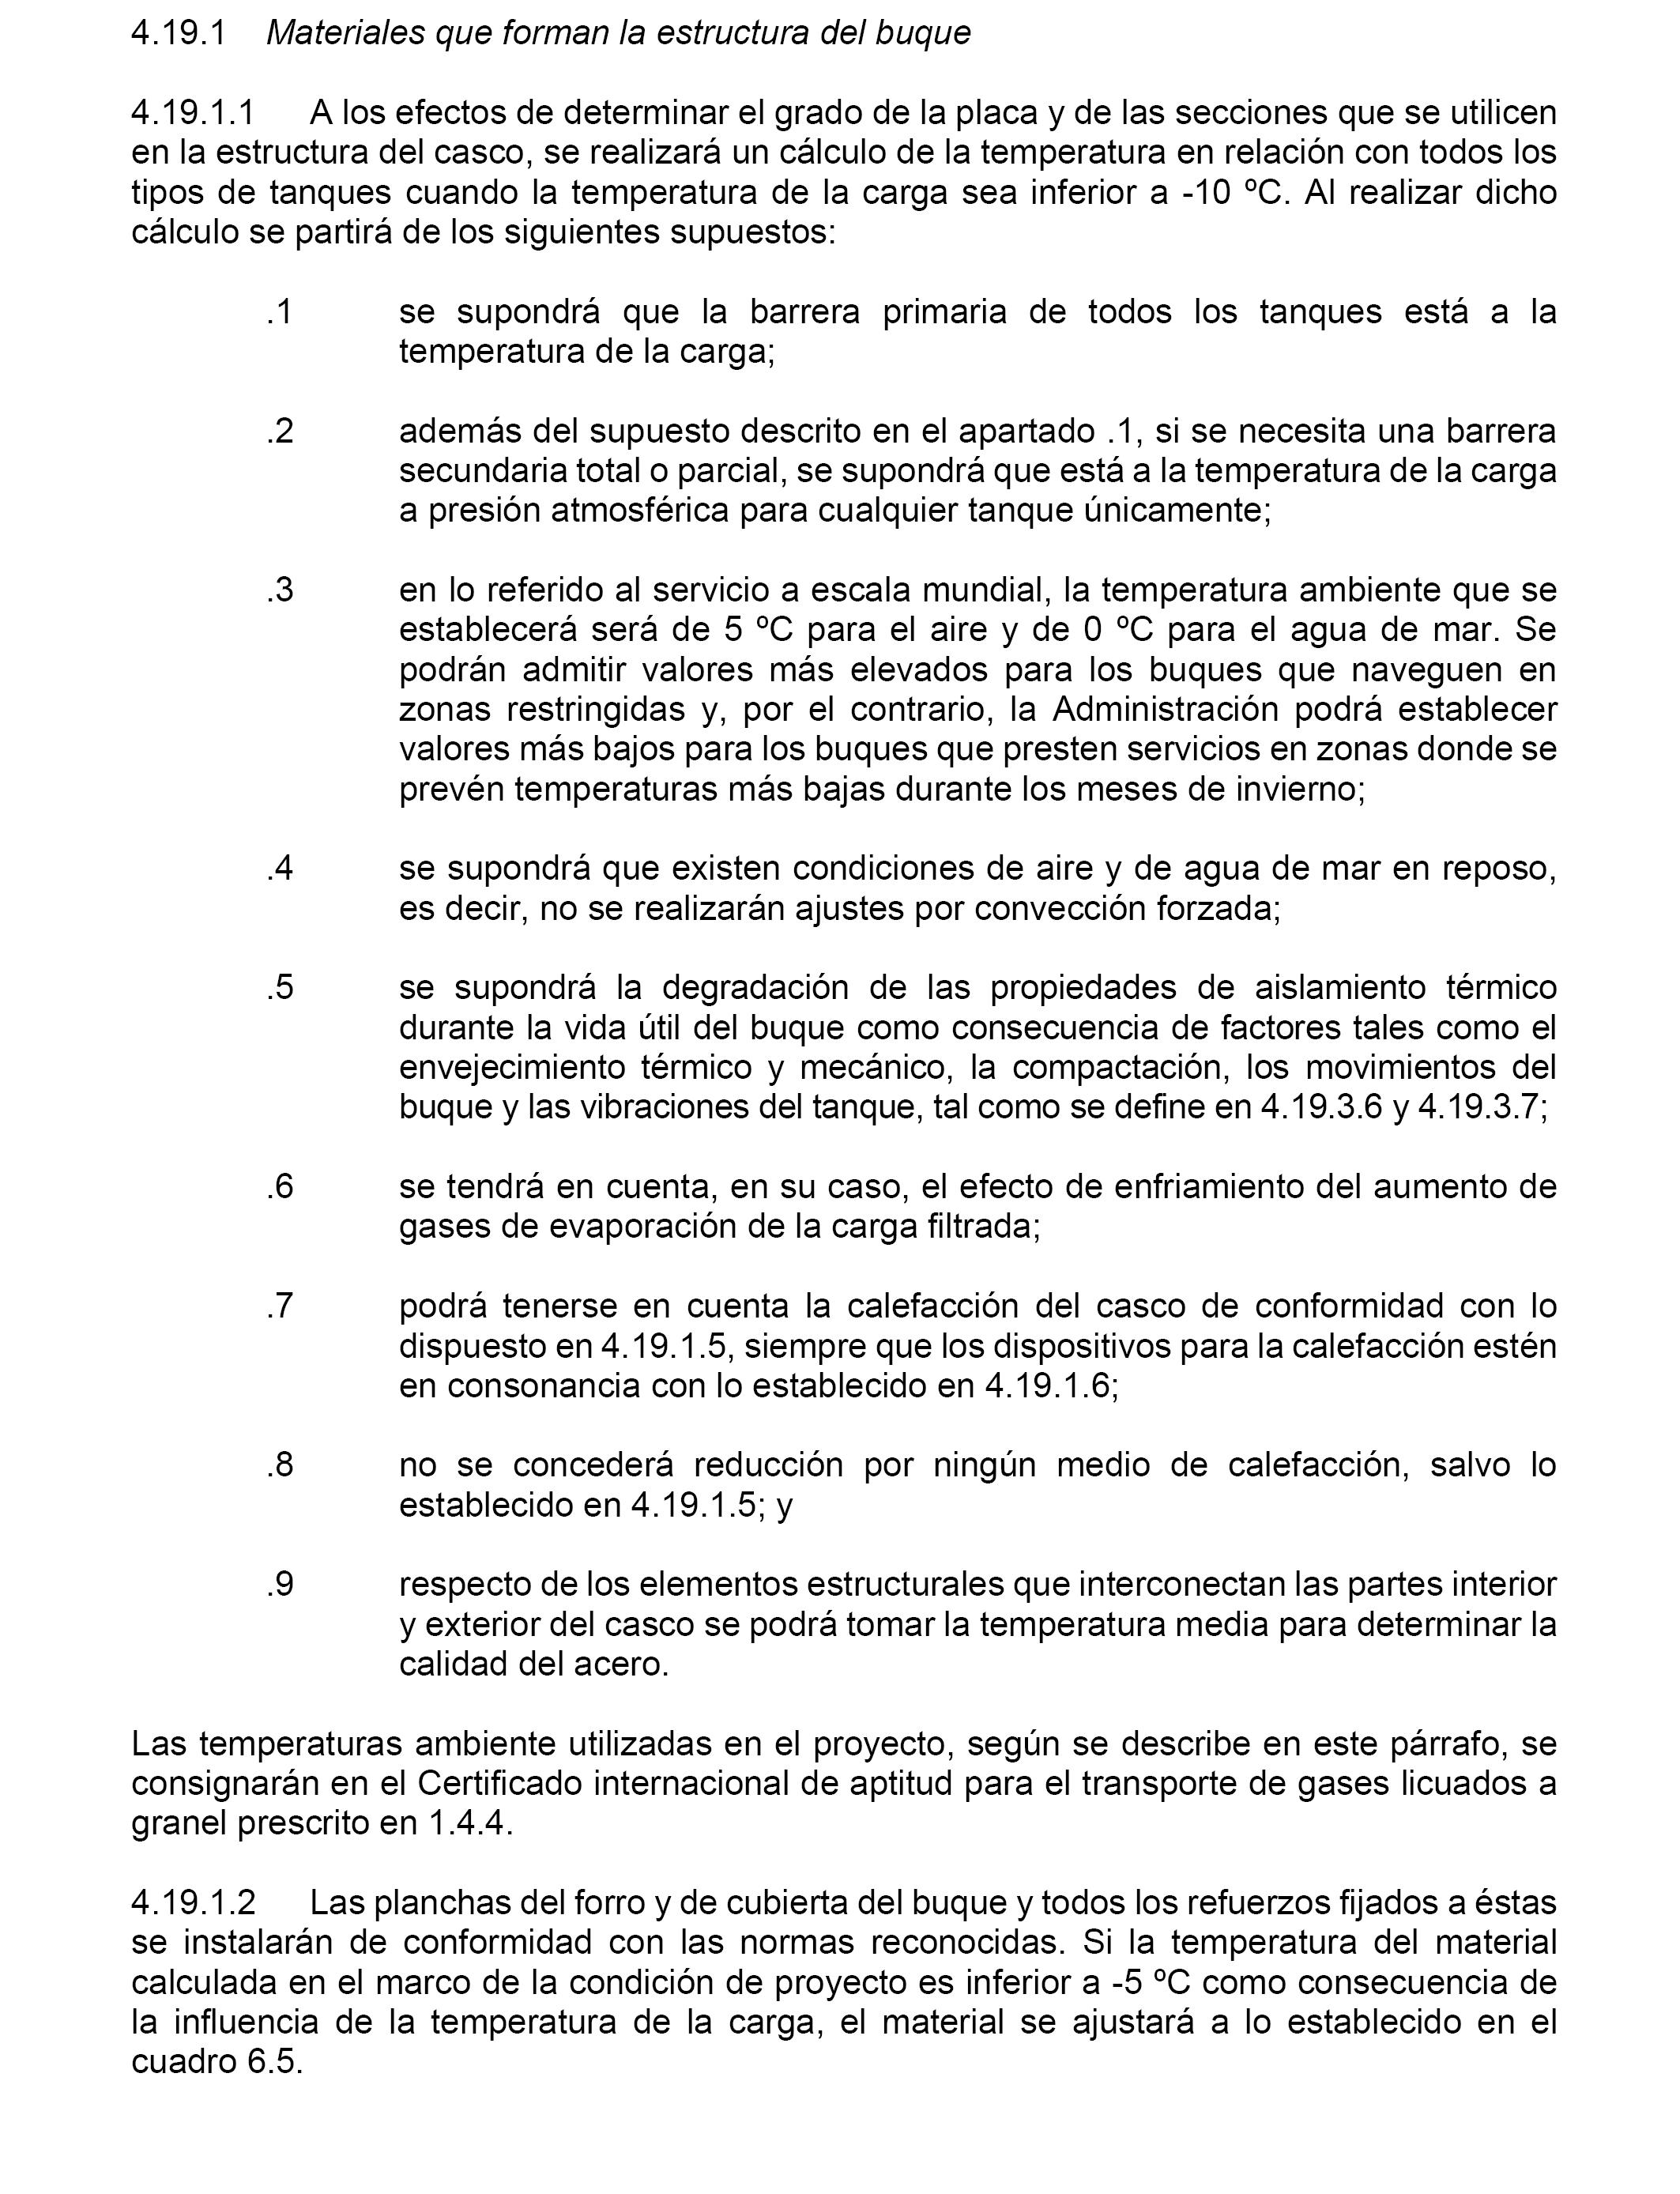 Encantador Marcos De Cuadros De Carga Viñeta - Ideas Personalizadas ...